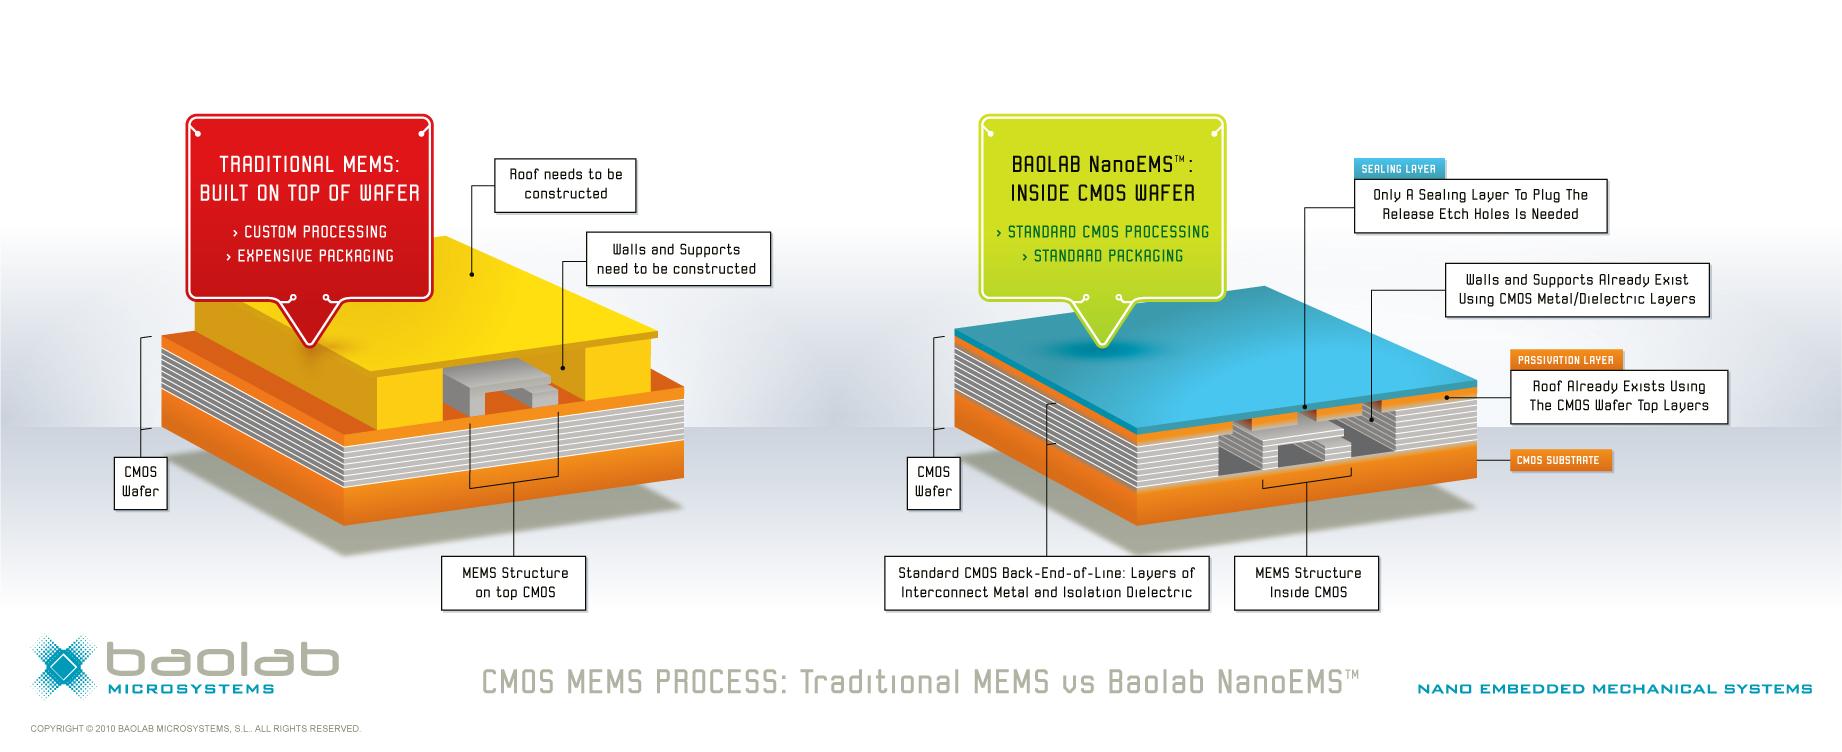 CMOS MEMS Process: Traditional MEMS vs Baolab NanoEMS™